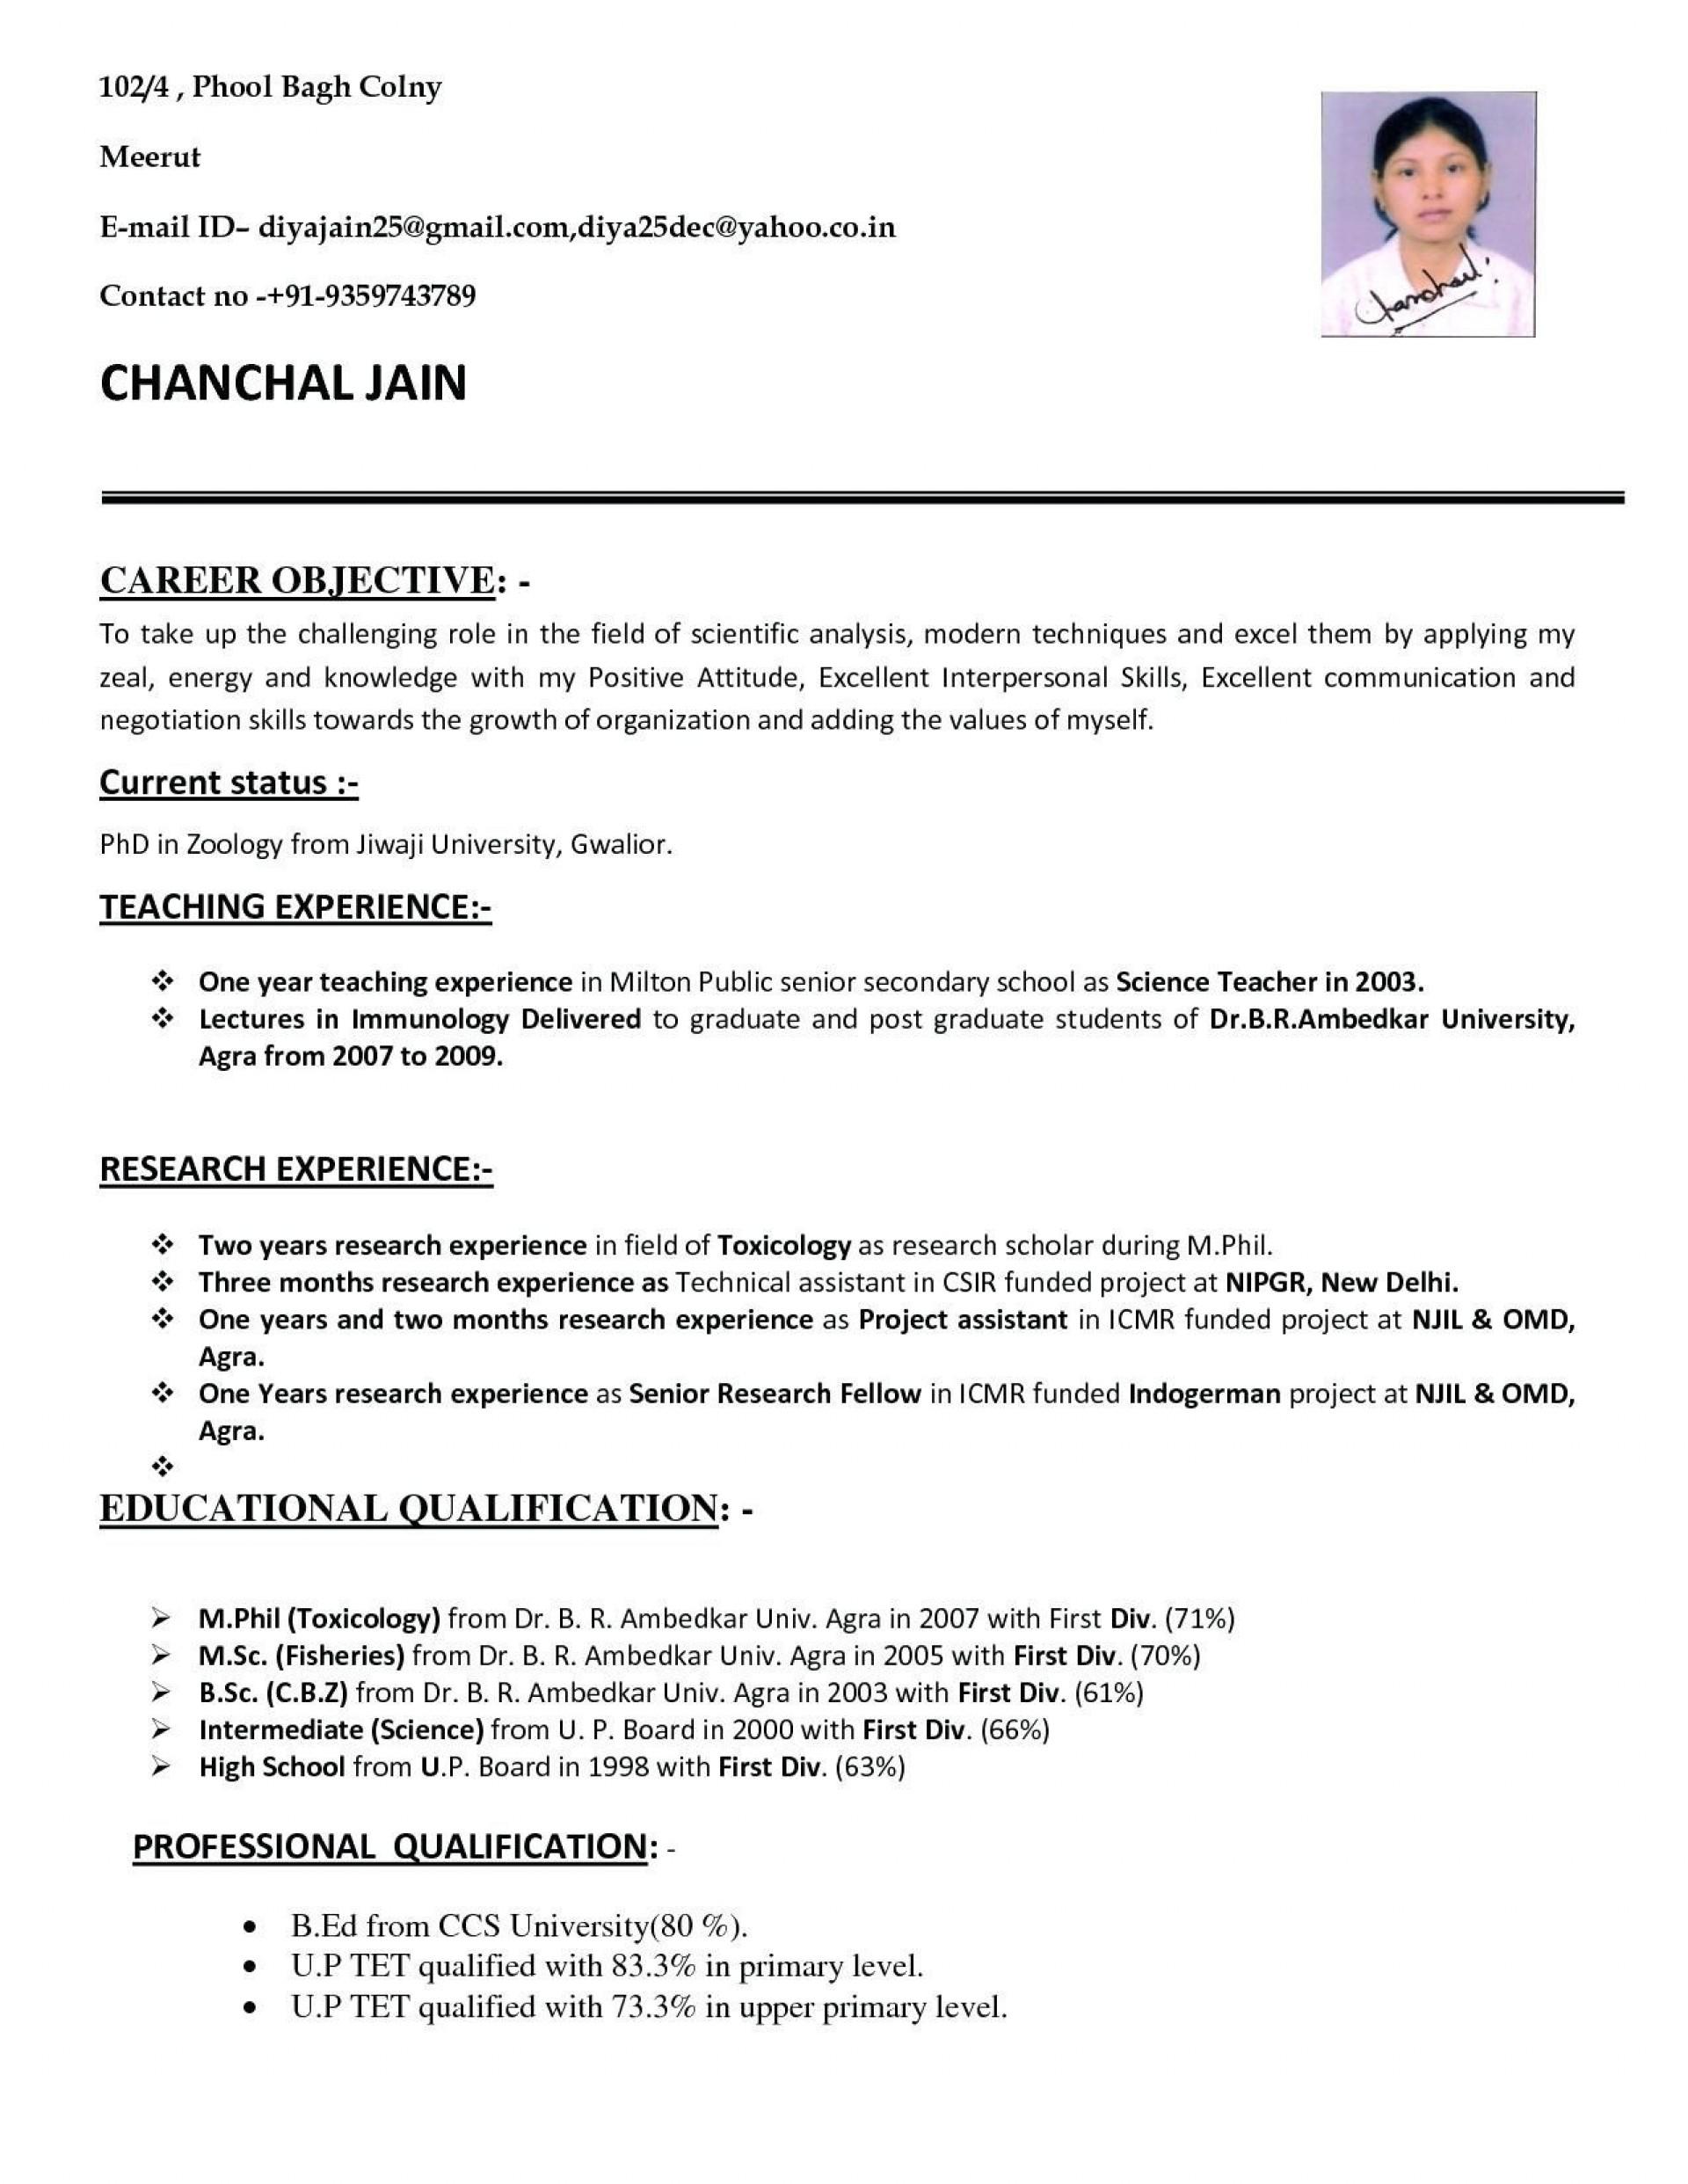 008 Impressive Resume Sample For Teaching Job In India Design  School Principal Position1920